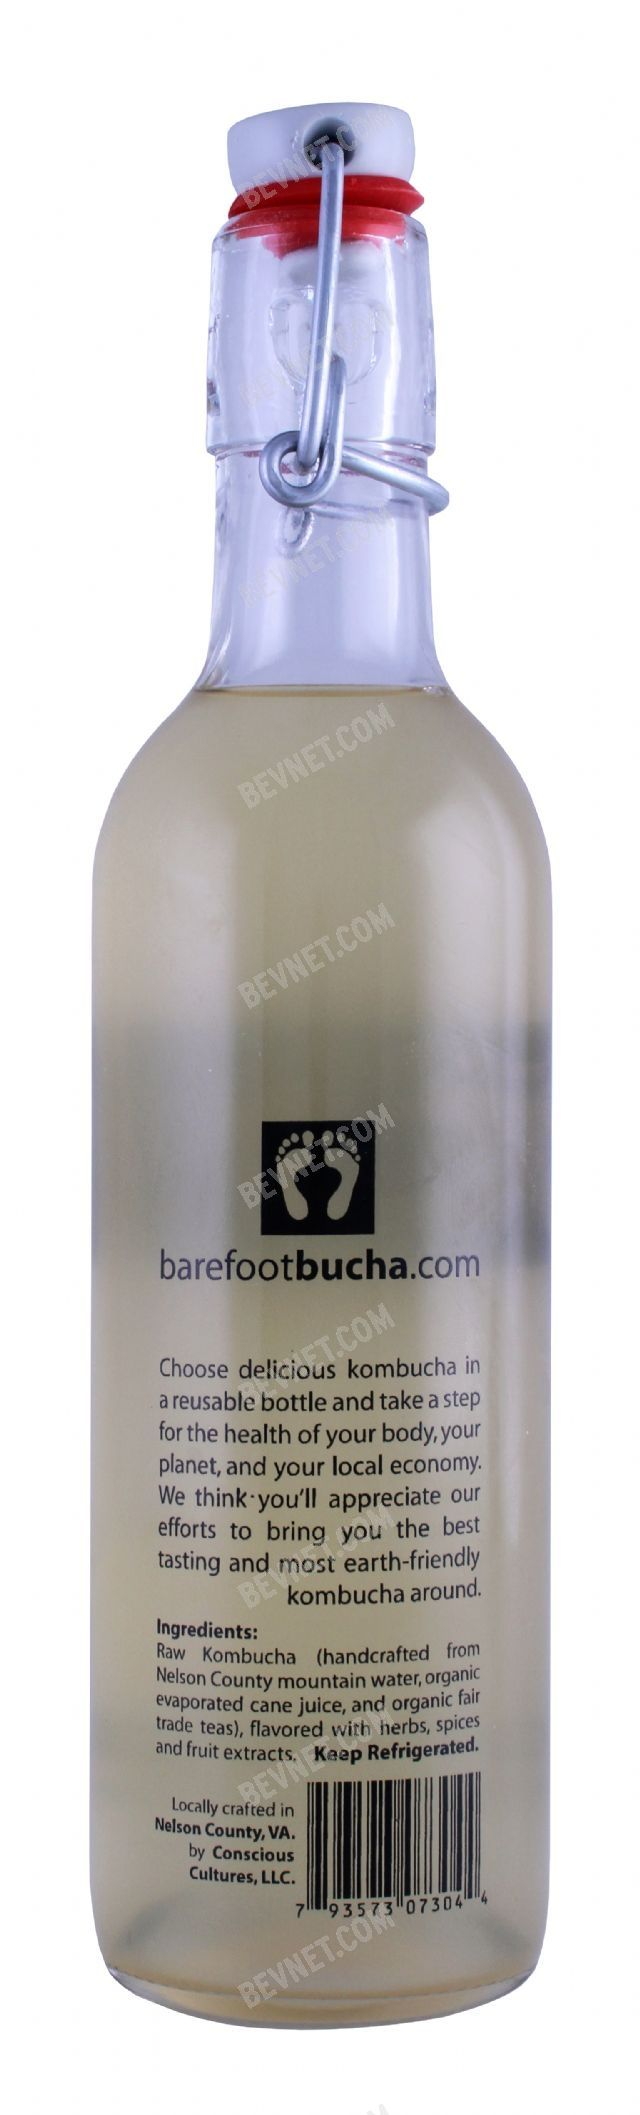 Barefoot Bucha: